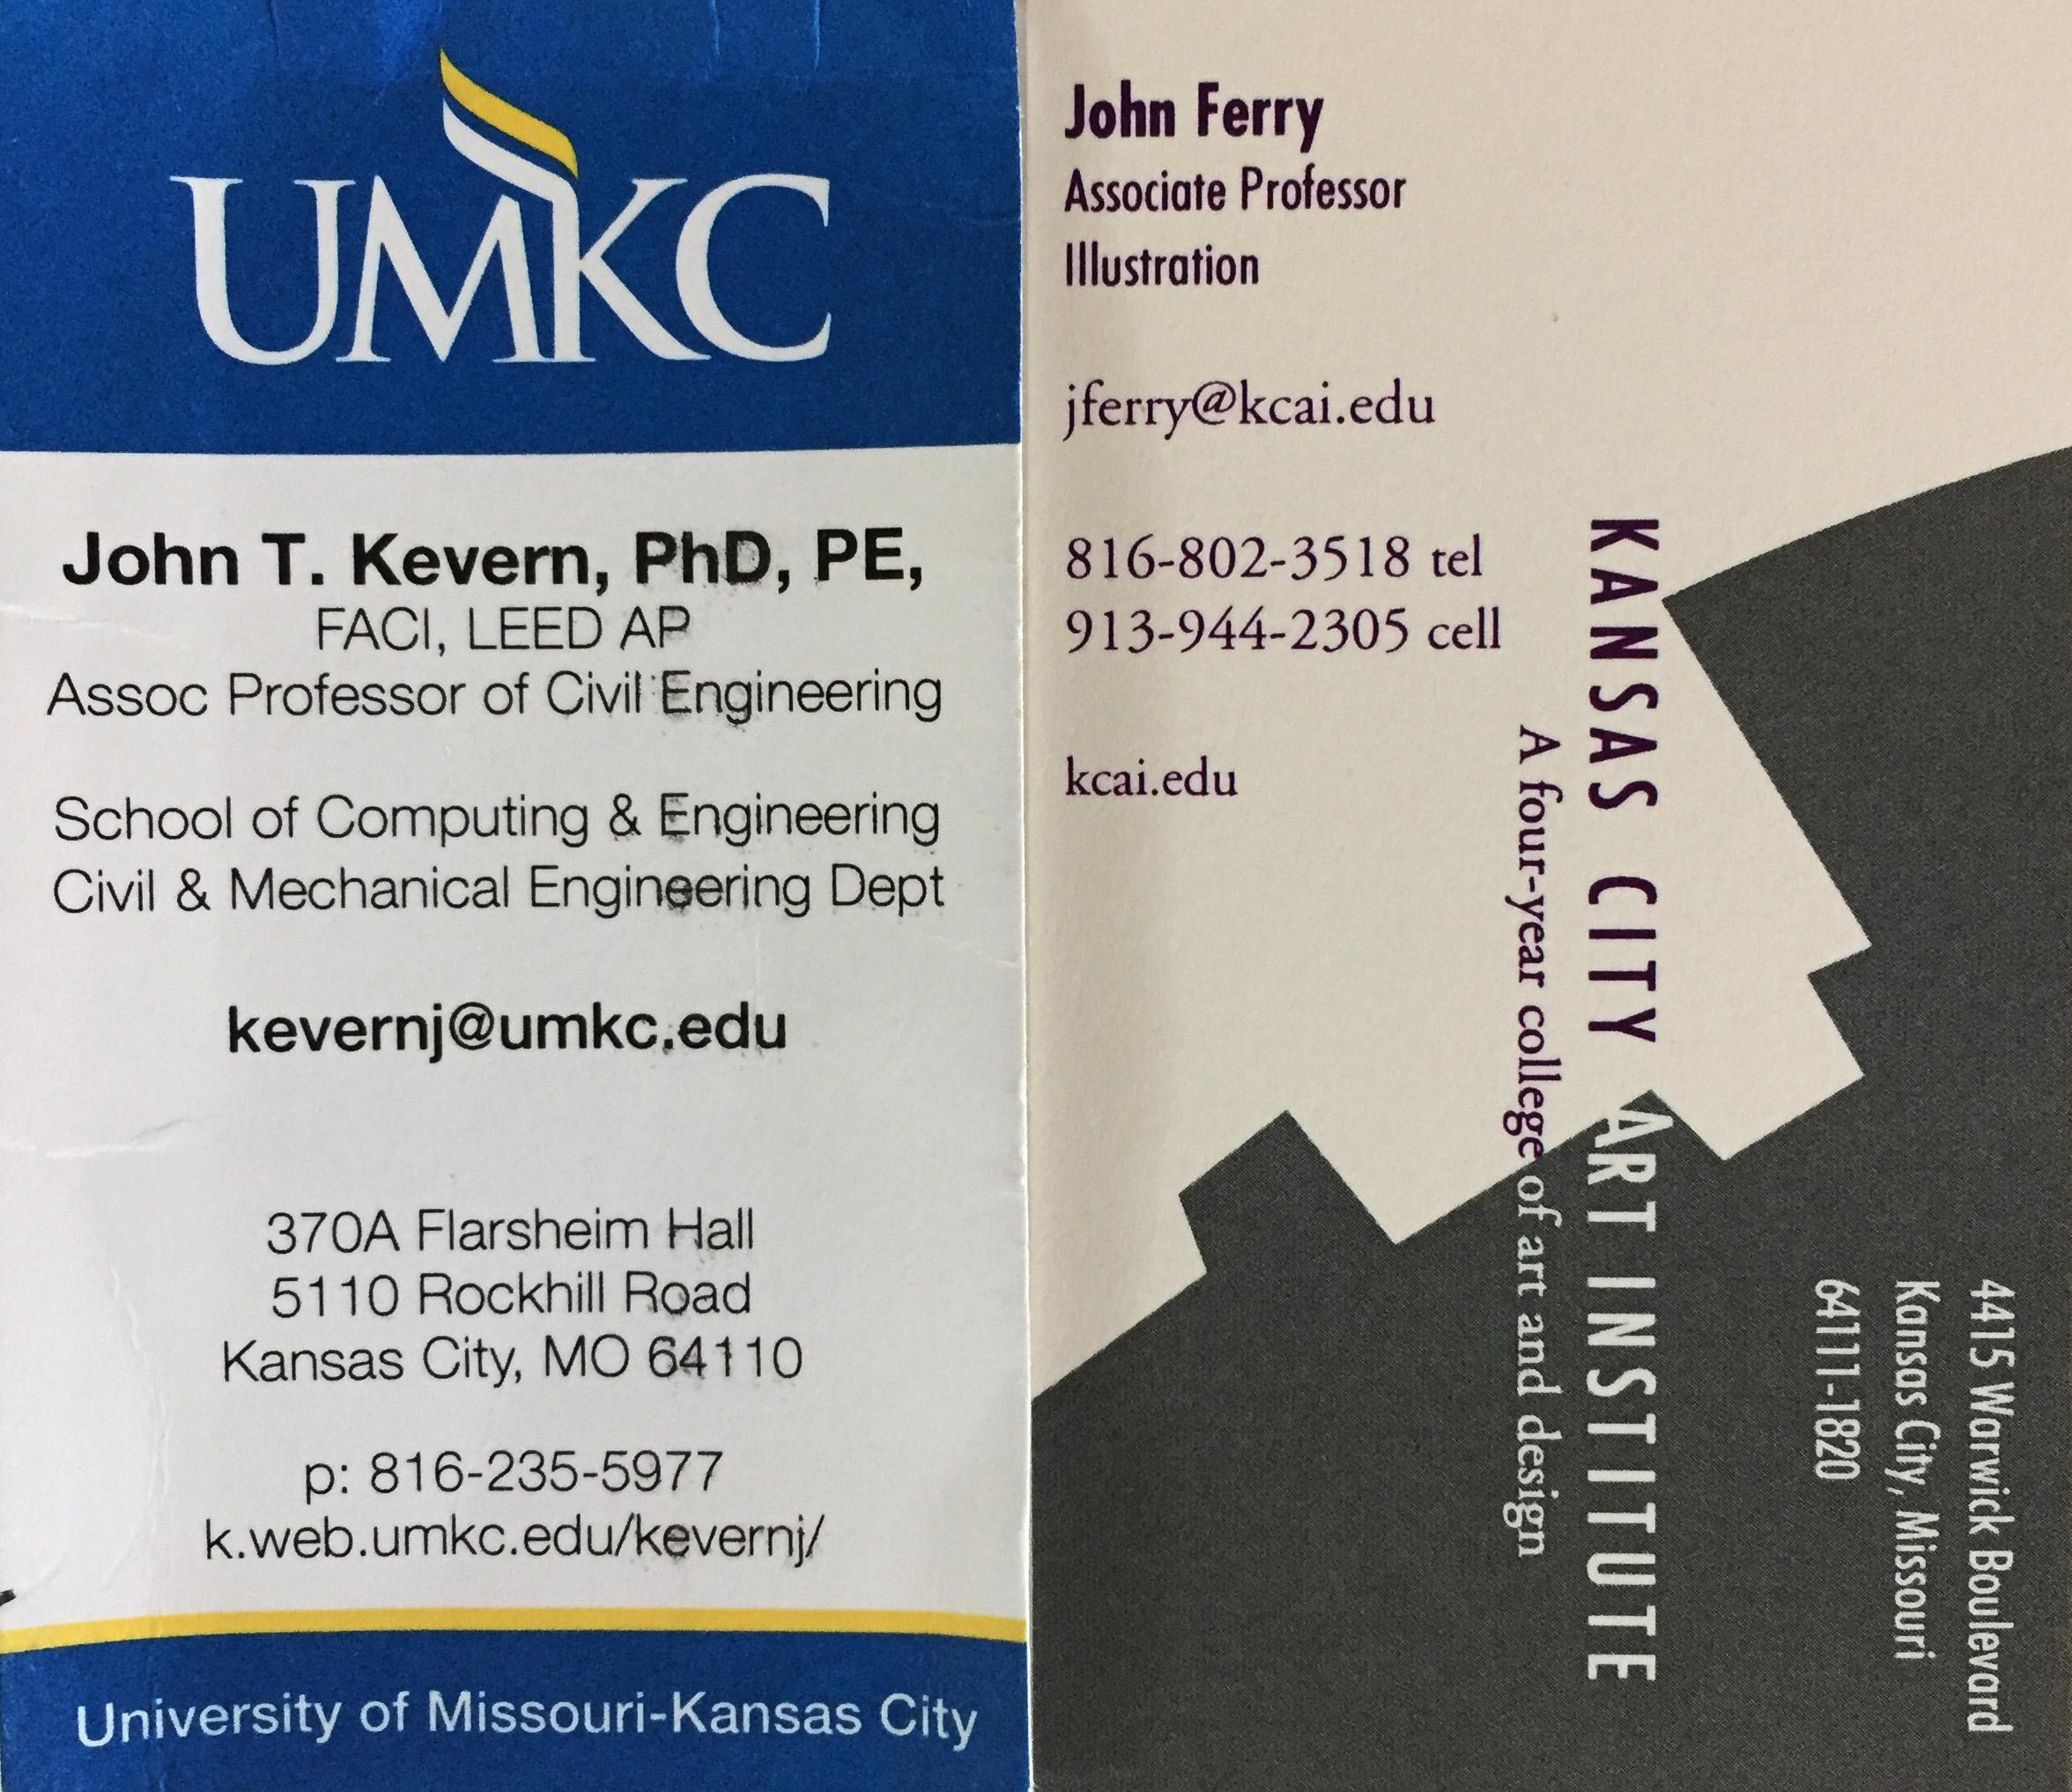 businesscardsumkckcai.jpg